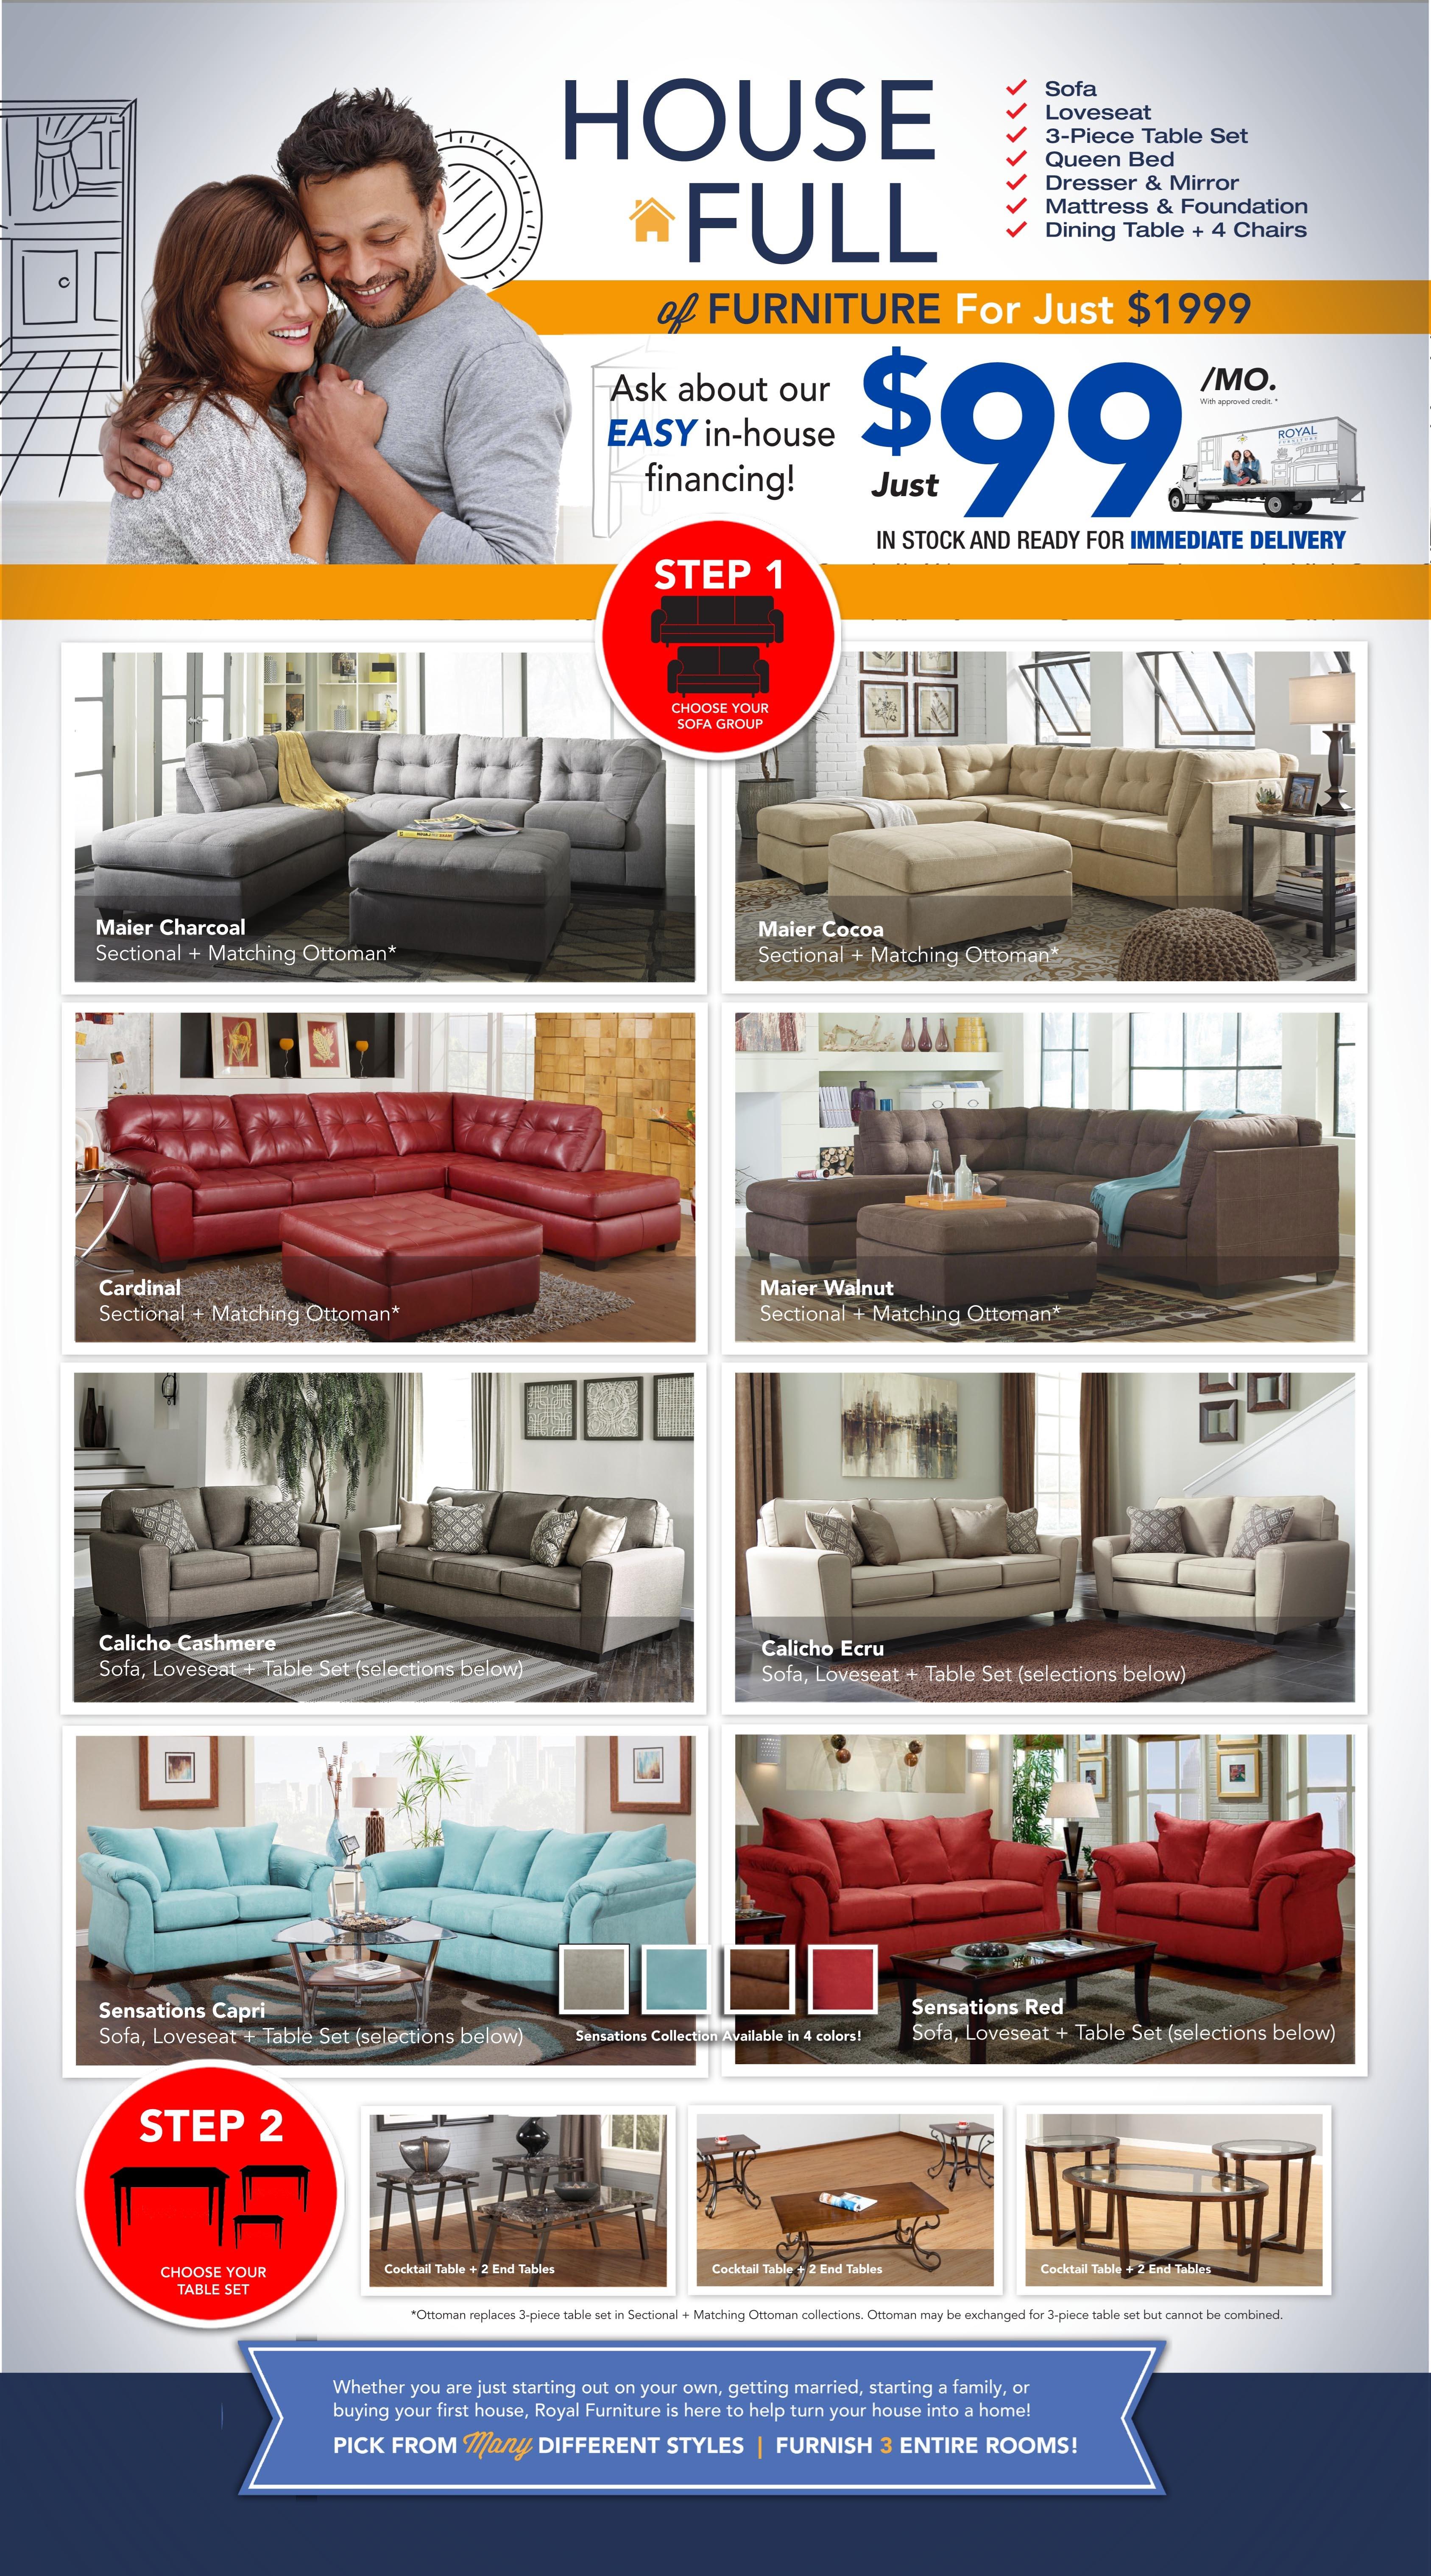 House Full Furniture Package. Royal House Full Furniture Package   Royal Furniture   Memphis